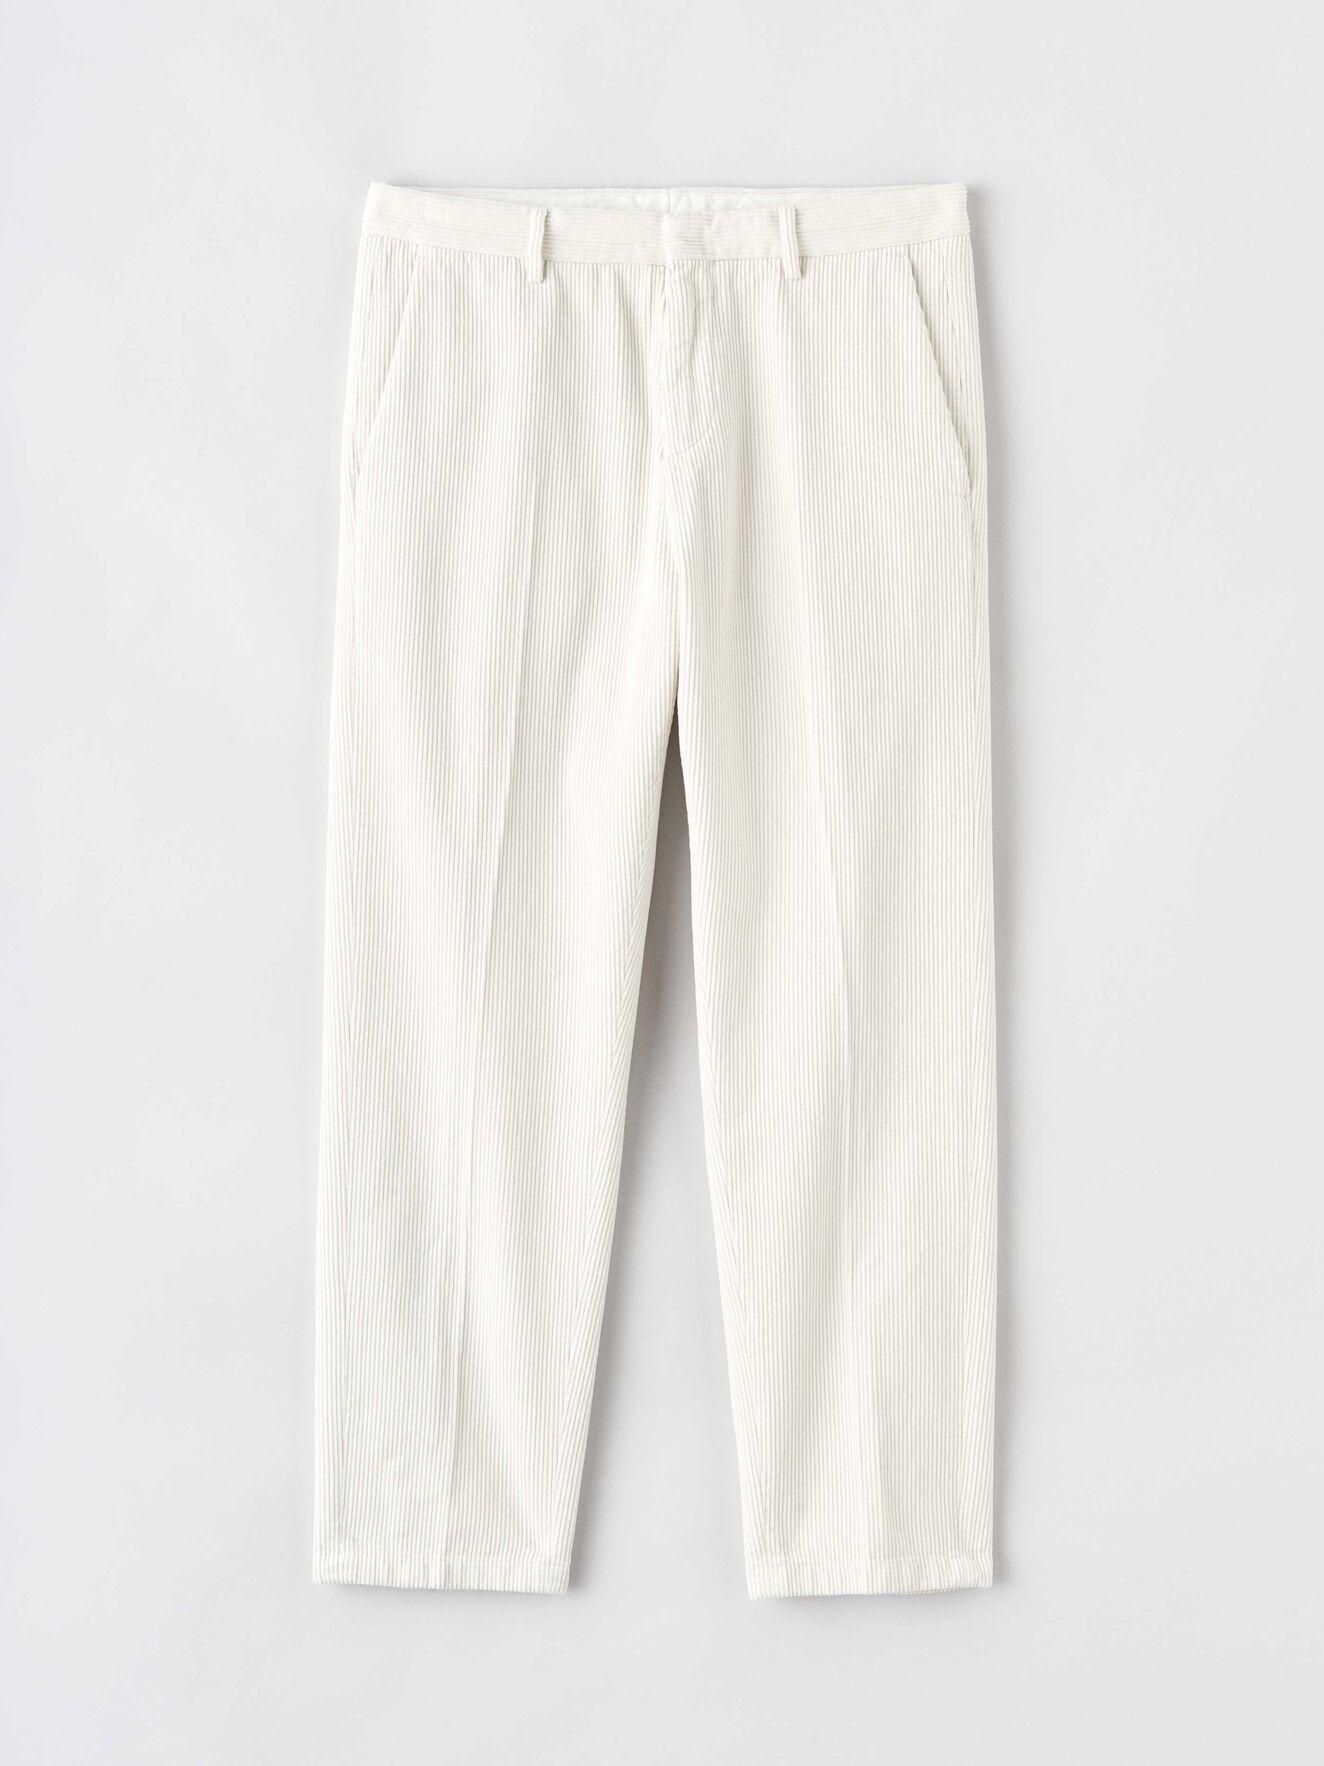 Cone Ppt Off White Cord Trouser-1